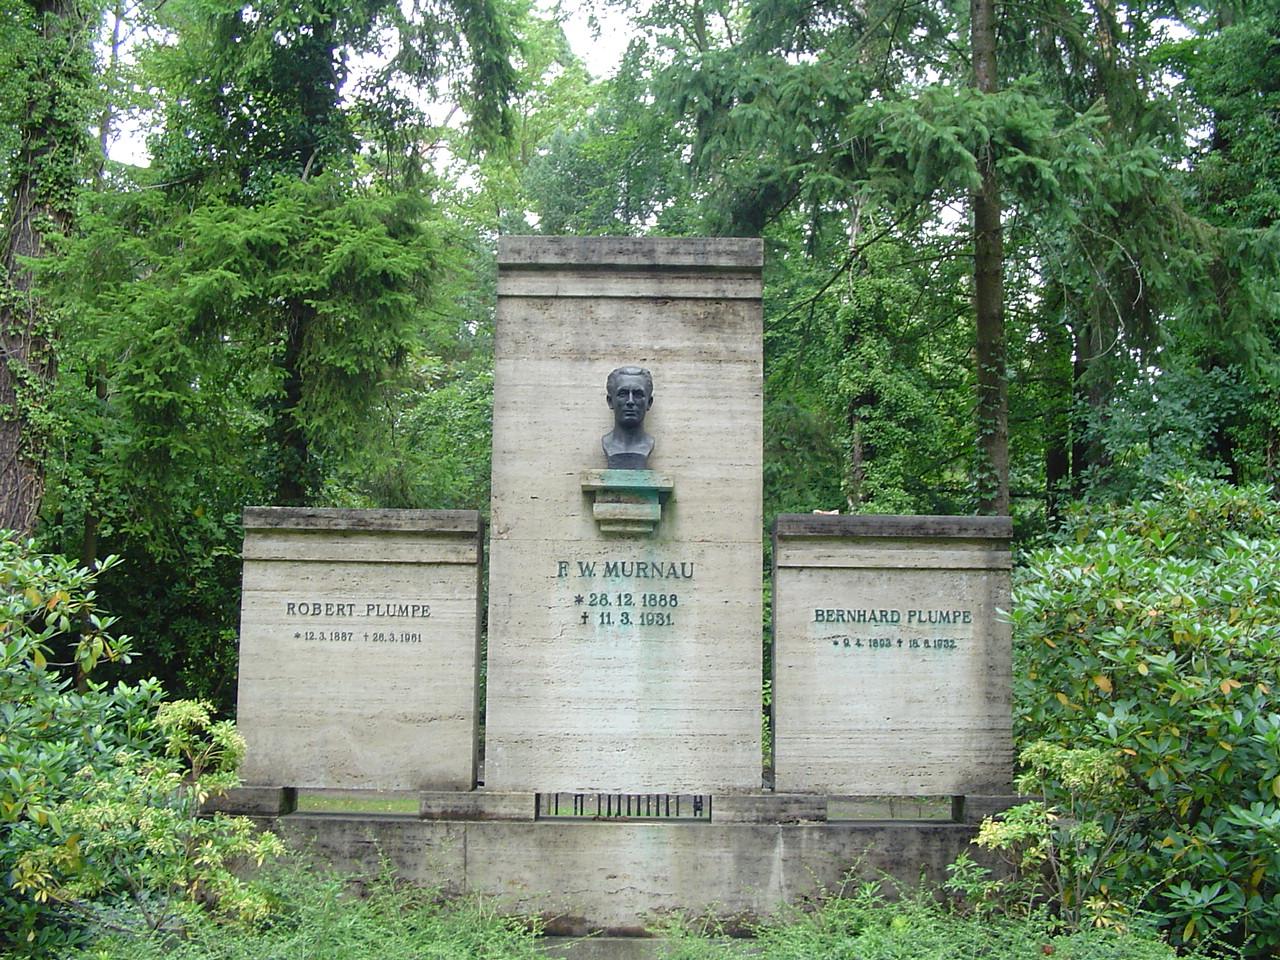 Grave of Friedrich Wilhelm Murnau